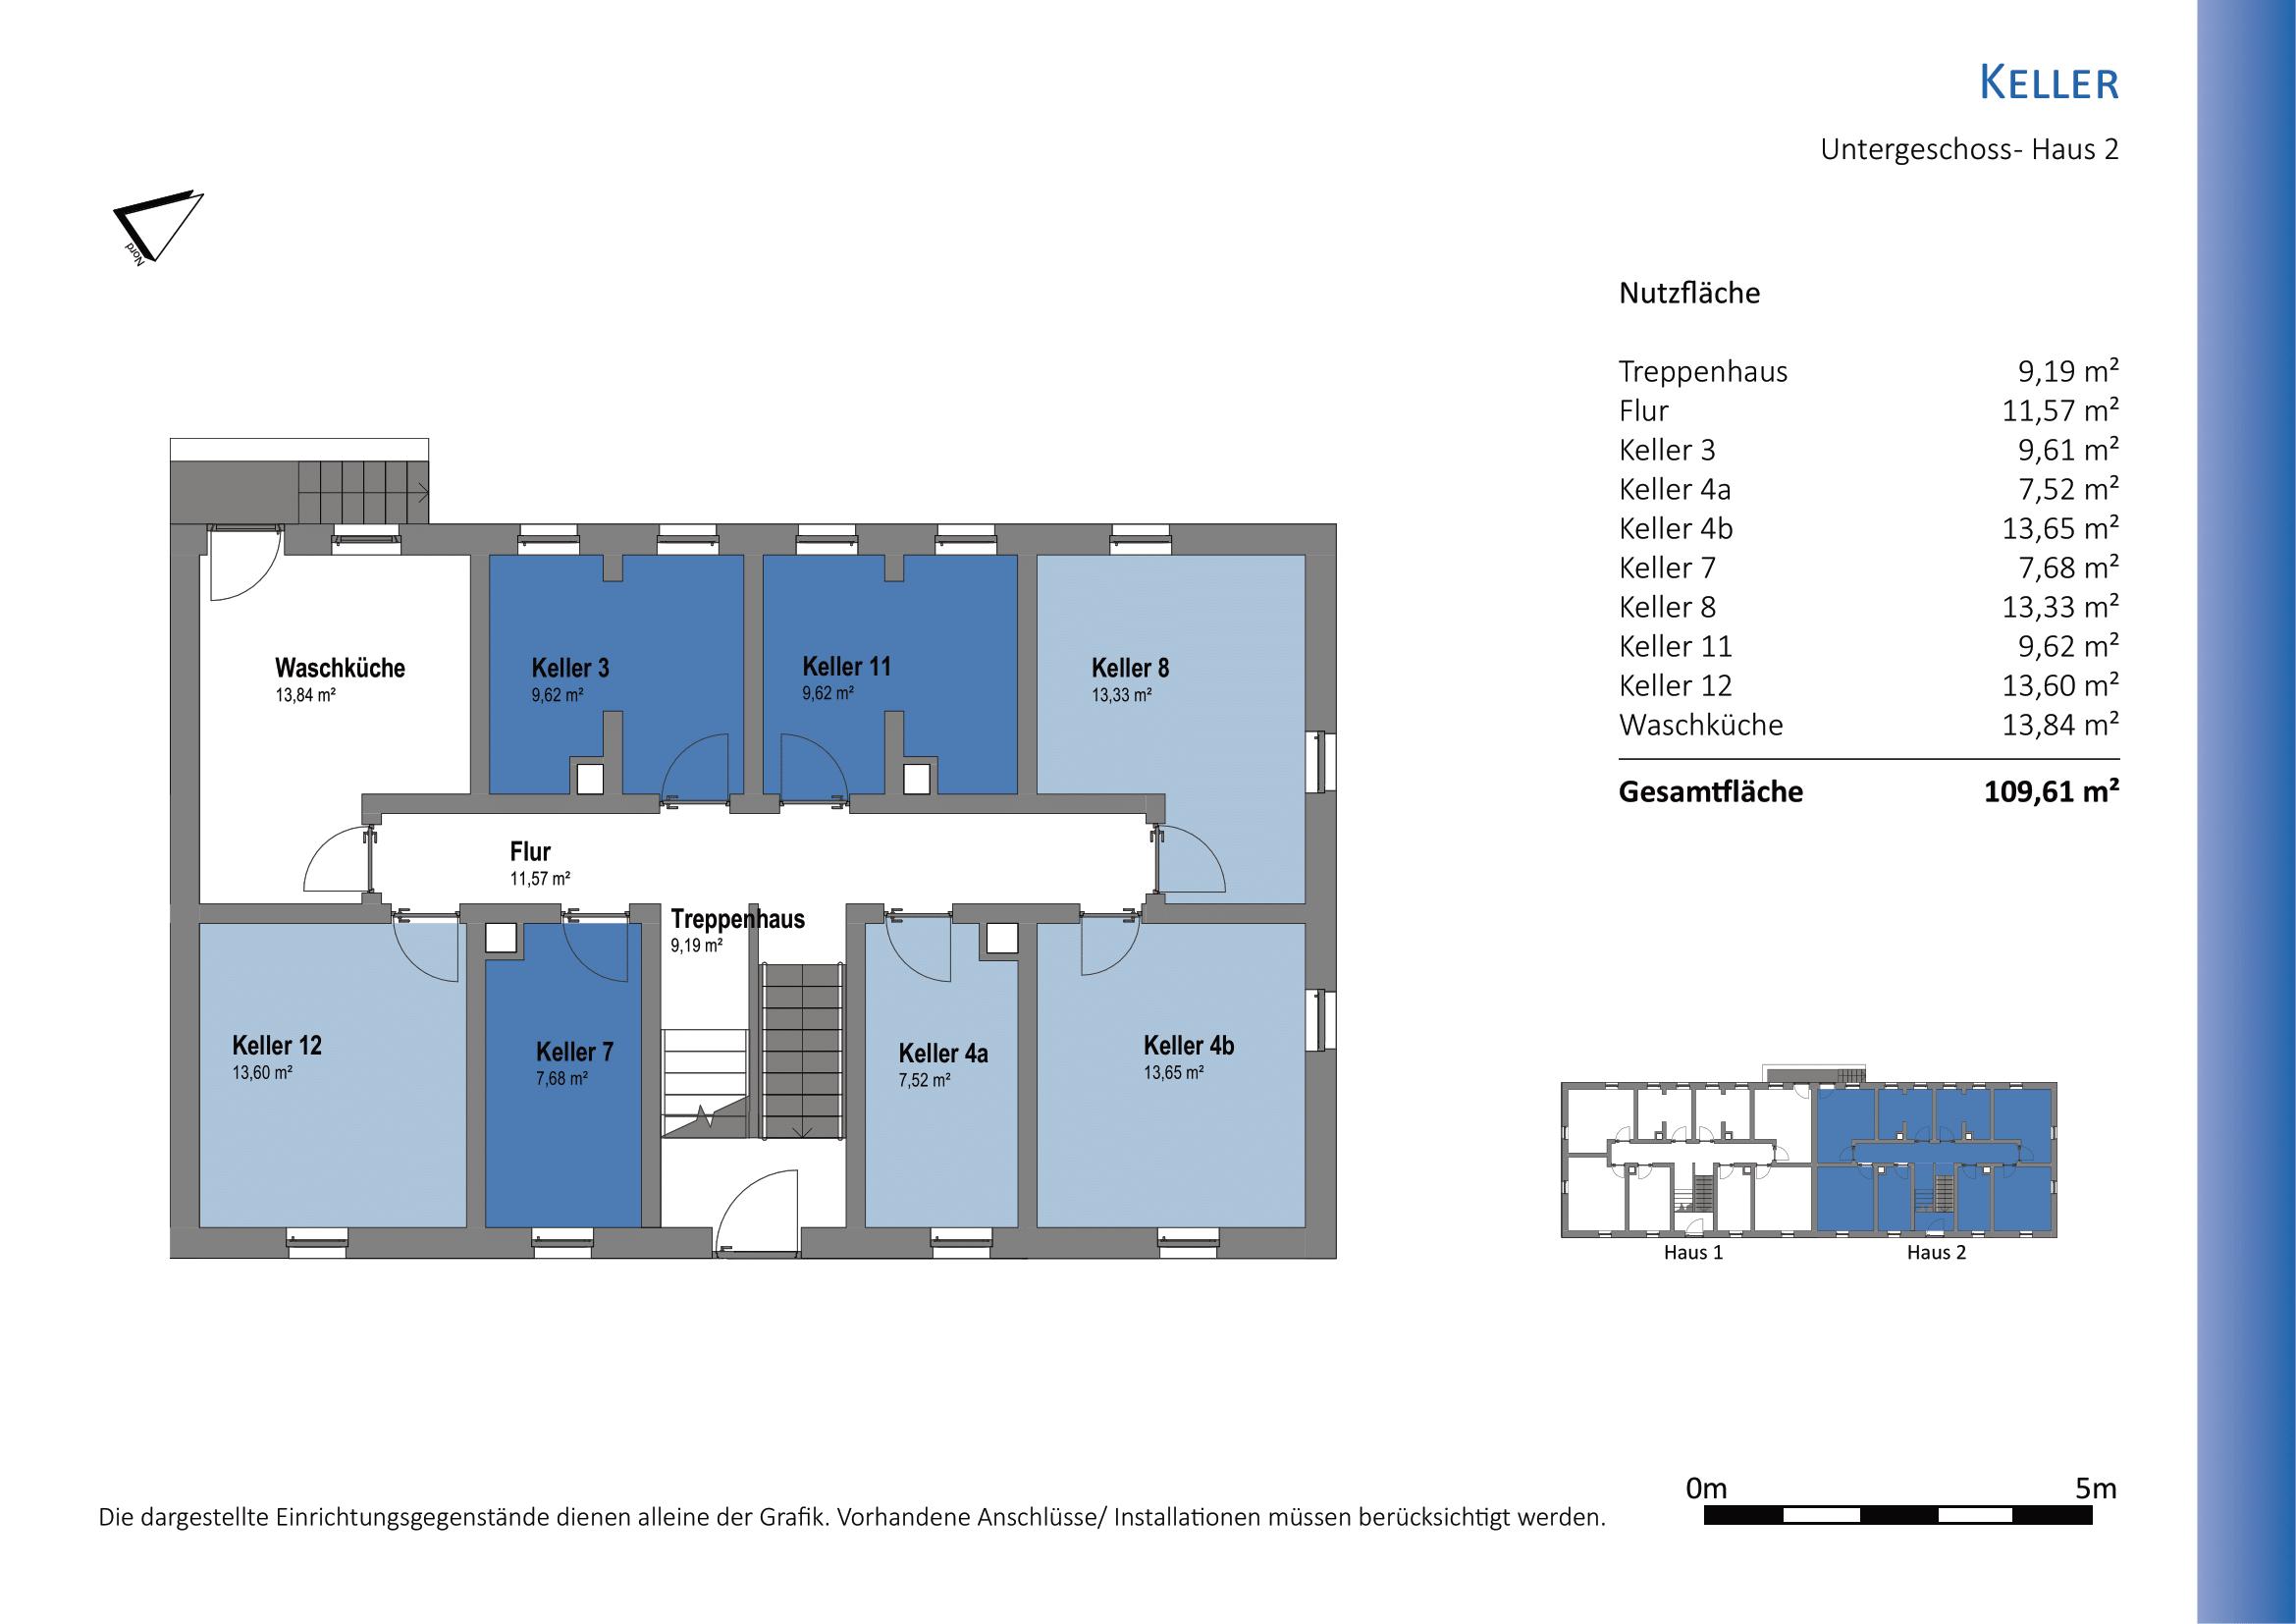 Keller Haus 2